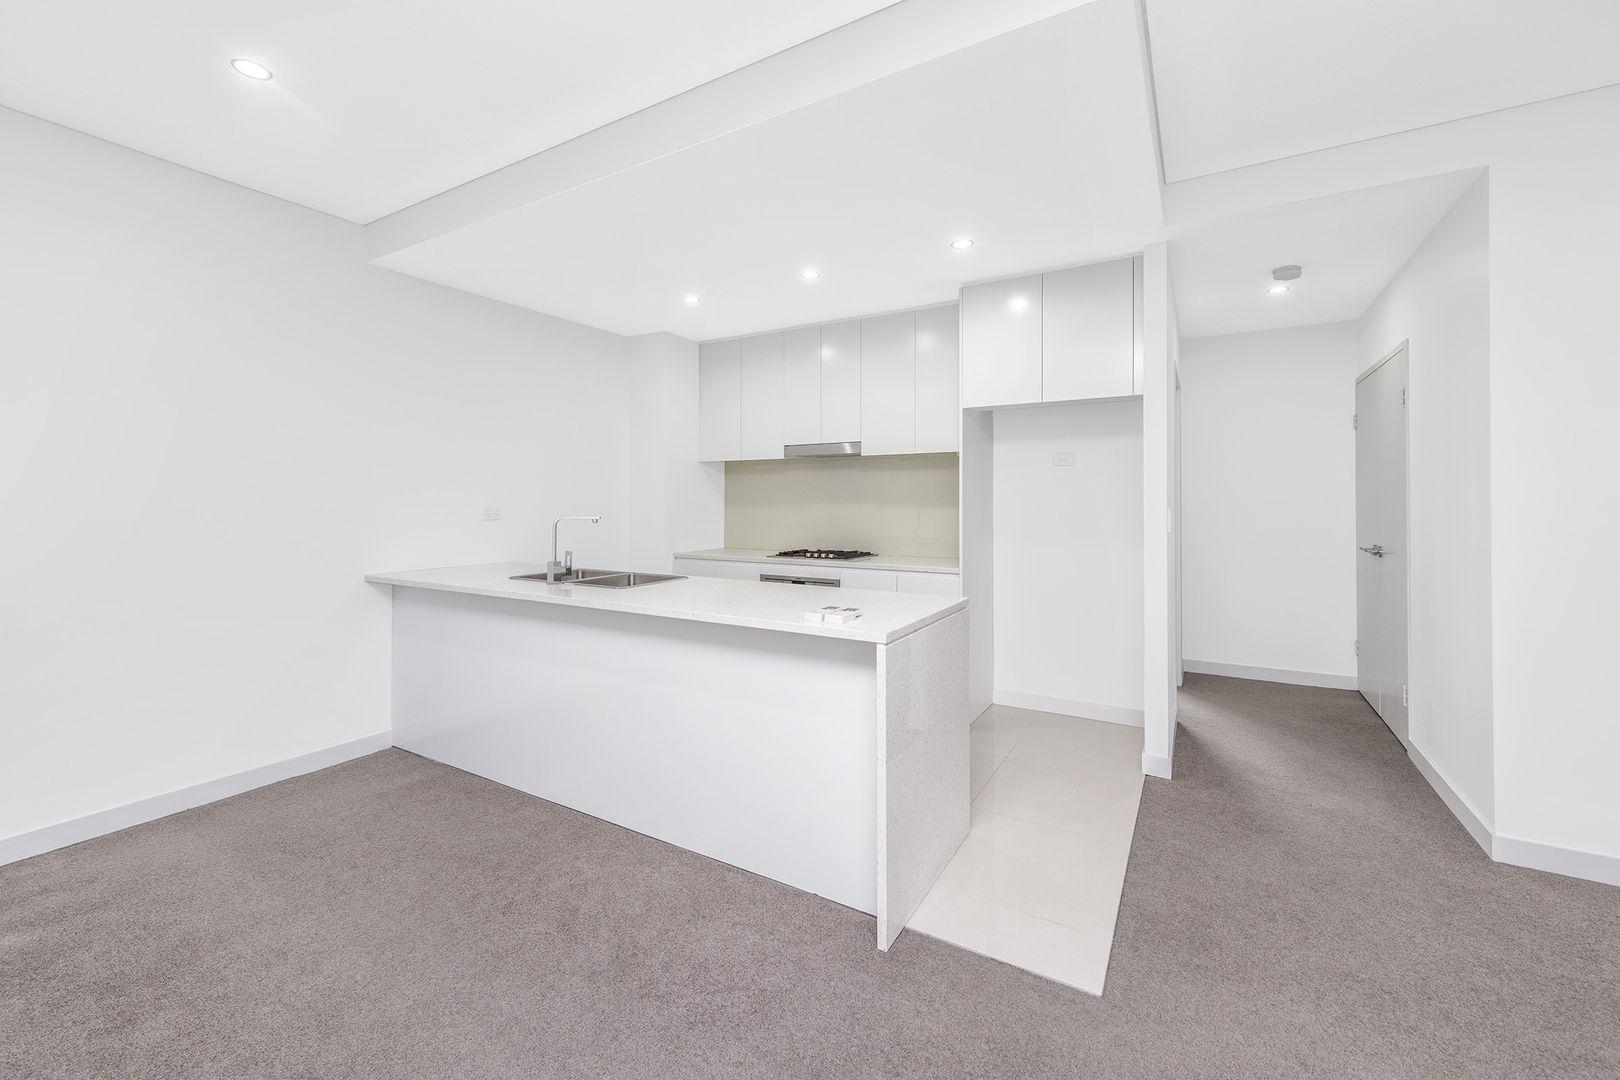 22/235 Homebush Road, Strathfield NSW 2135, Image 0